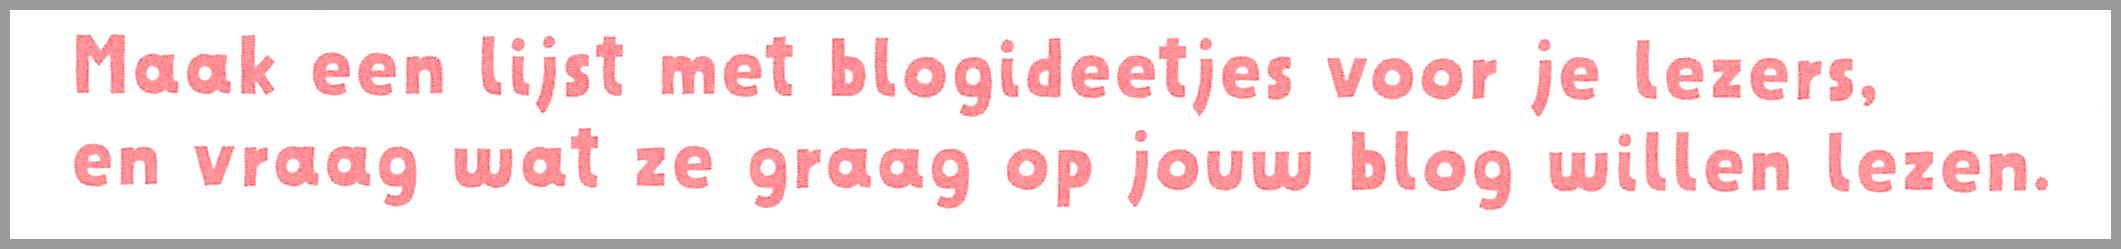 projectblogboek 21